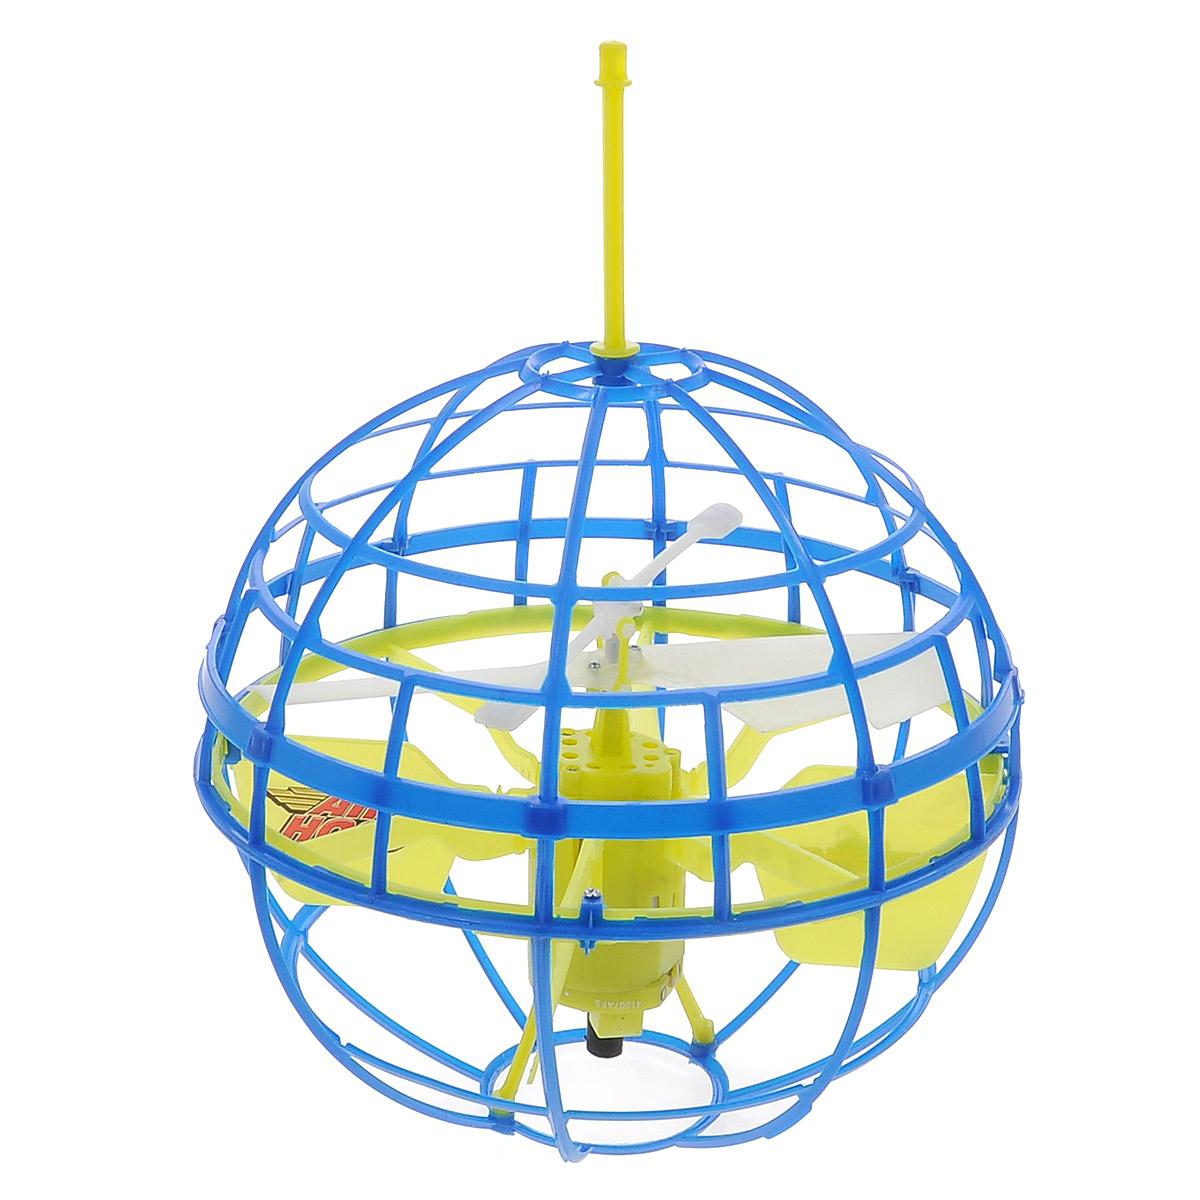 Air Hogs Игрушка на радиоуправлении Atmosphere Axis цвет синий - Радиоуправляемые игрушки